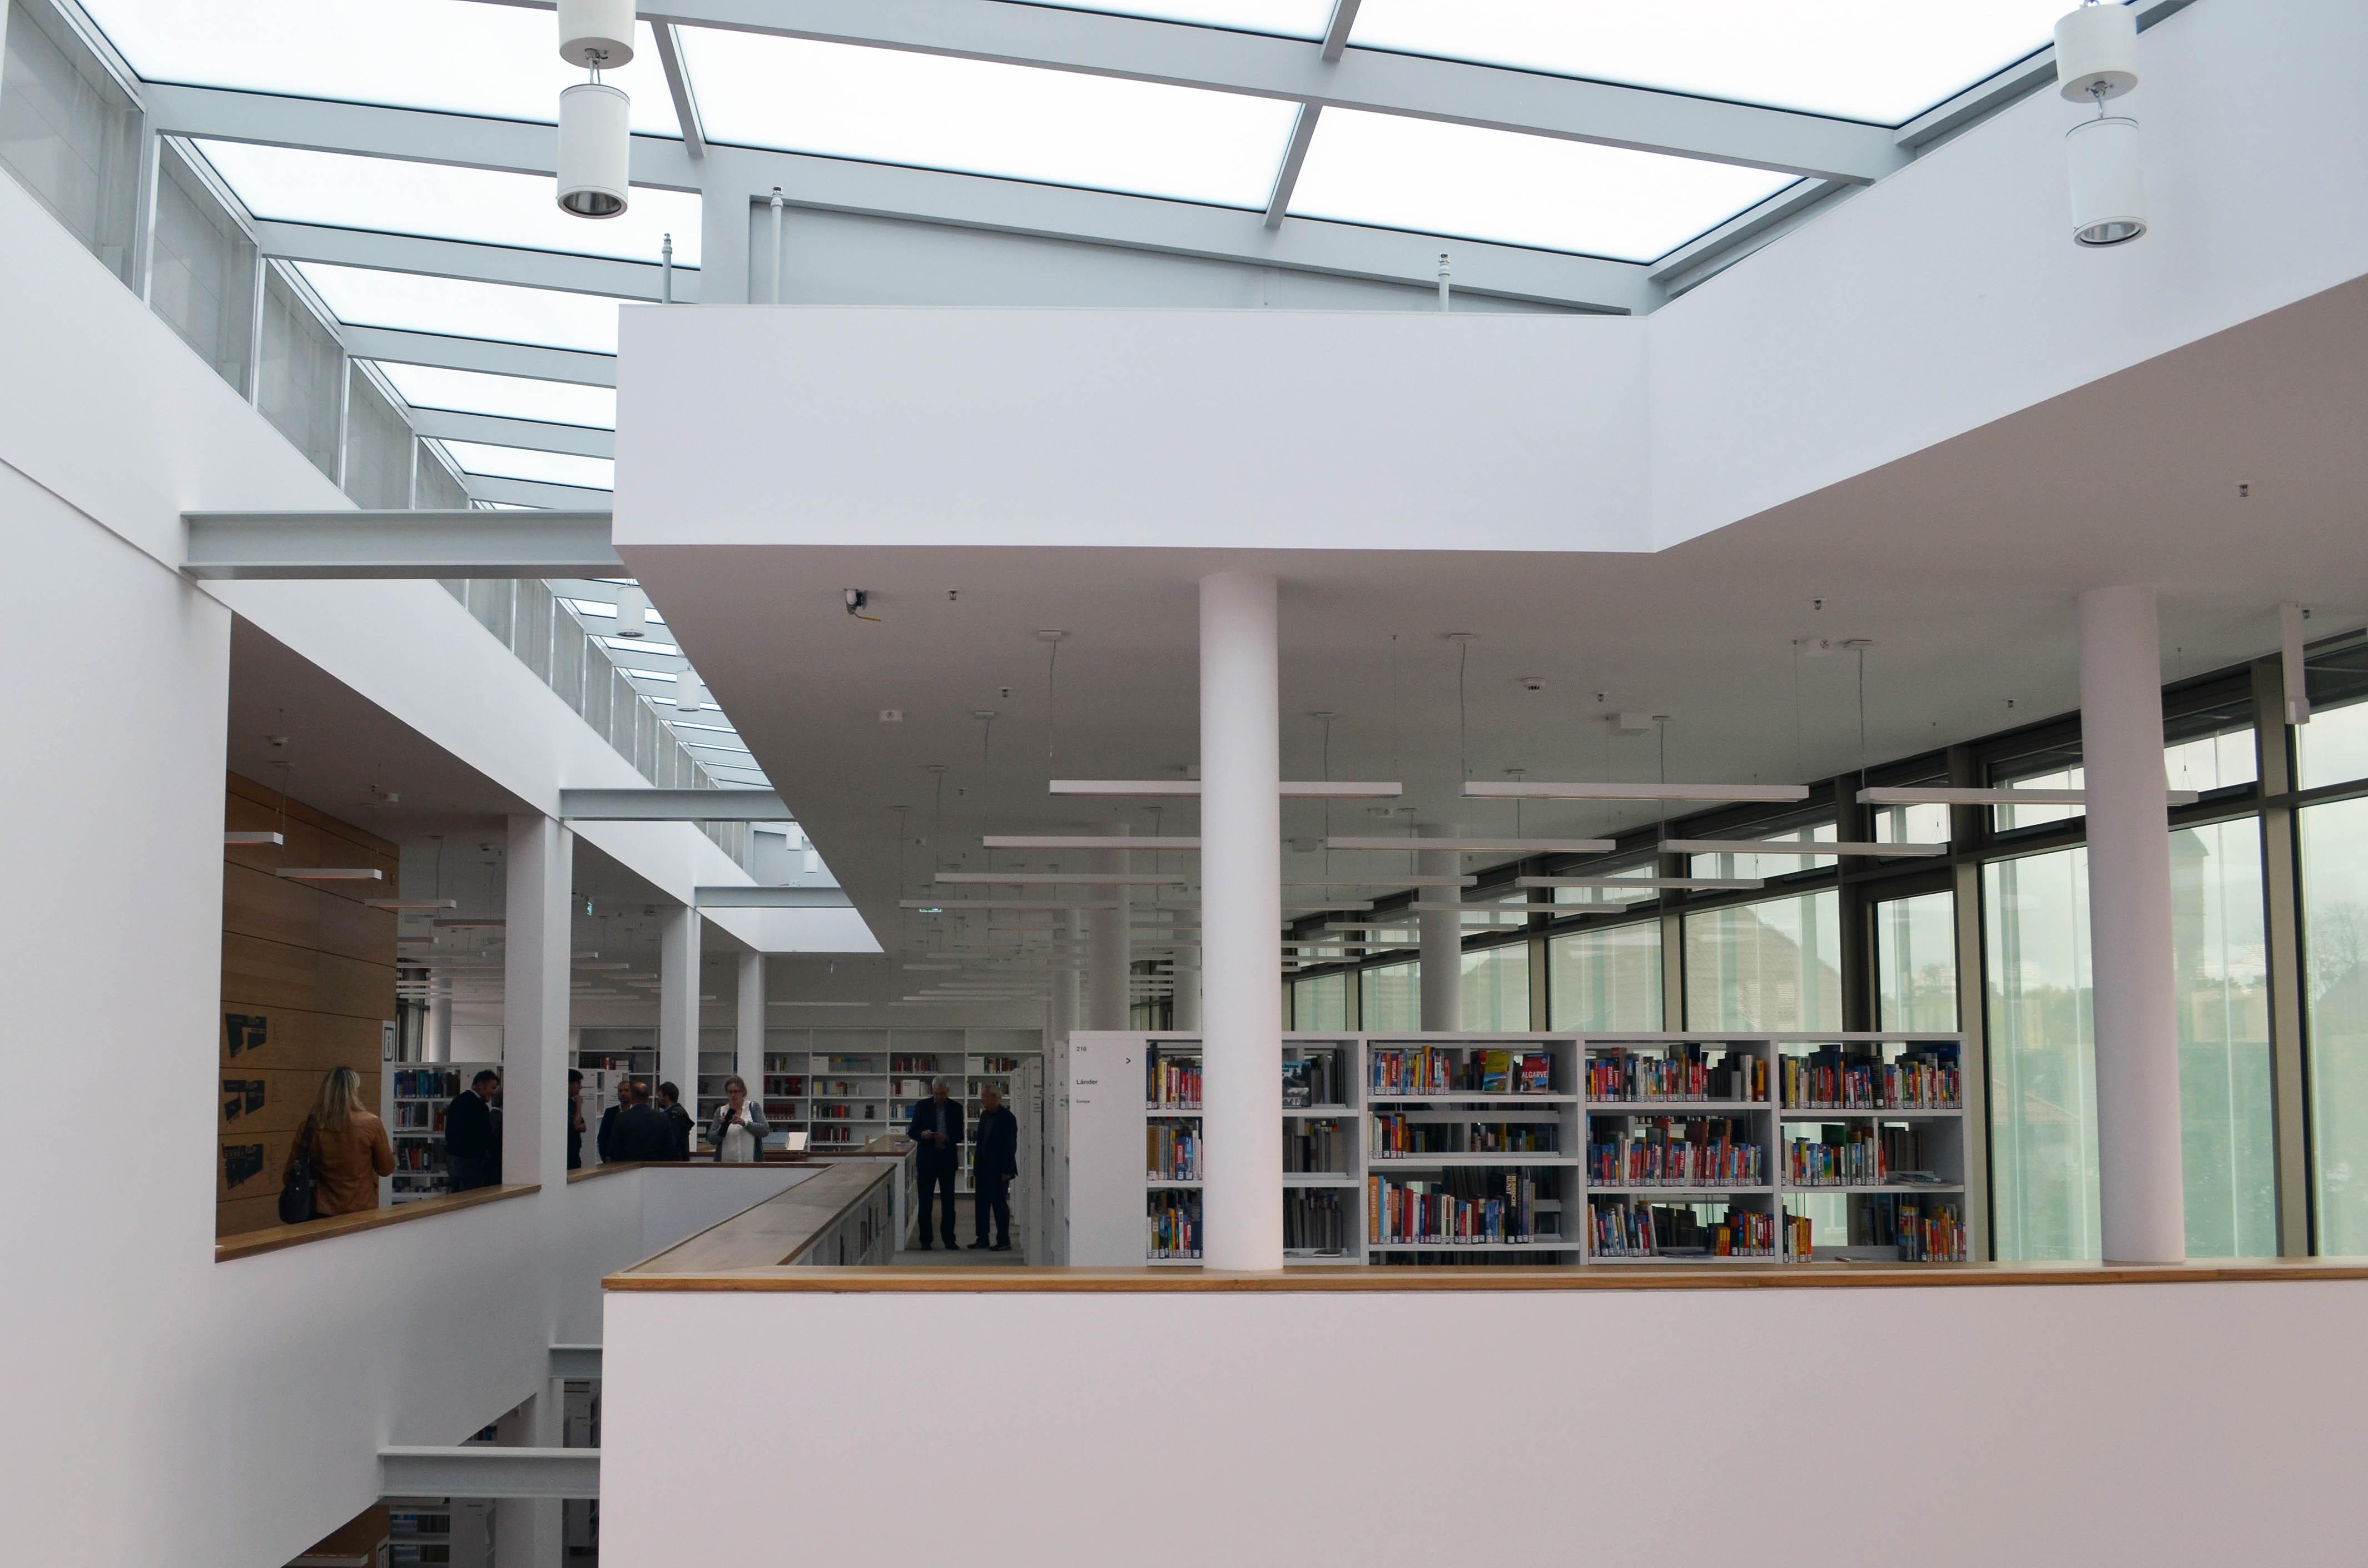 Architekt Nordhausen architekt nordhausen ing architekt tobias winkler ebertplatz